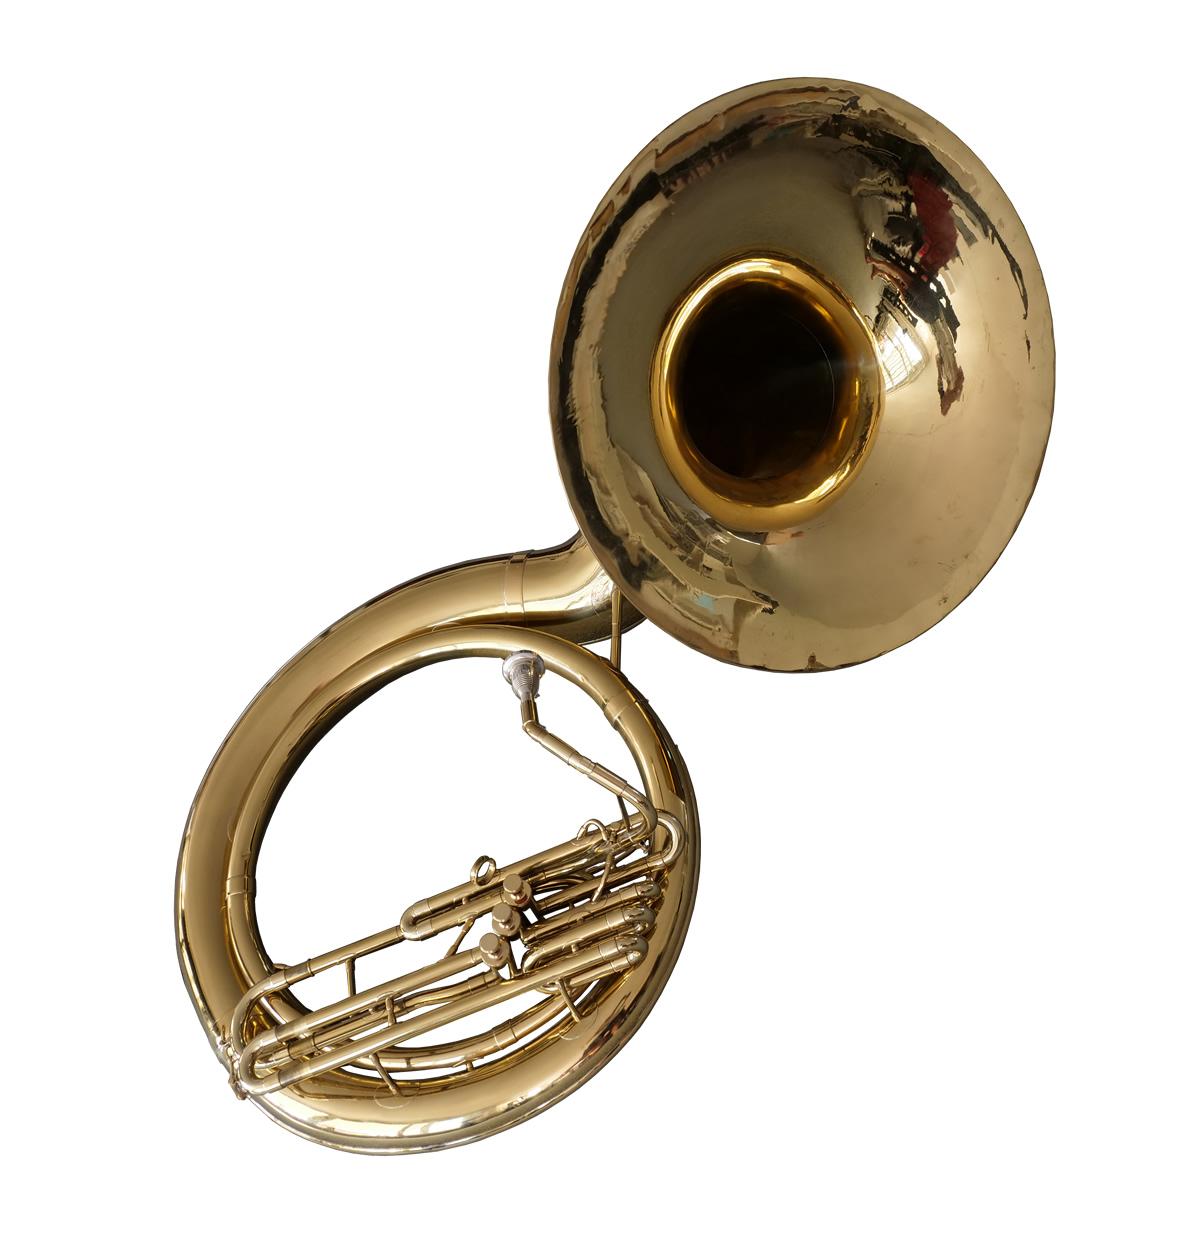 KVR: Best Service releases Chris Hein Orchestral Brass